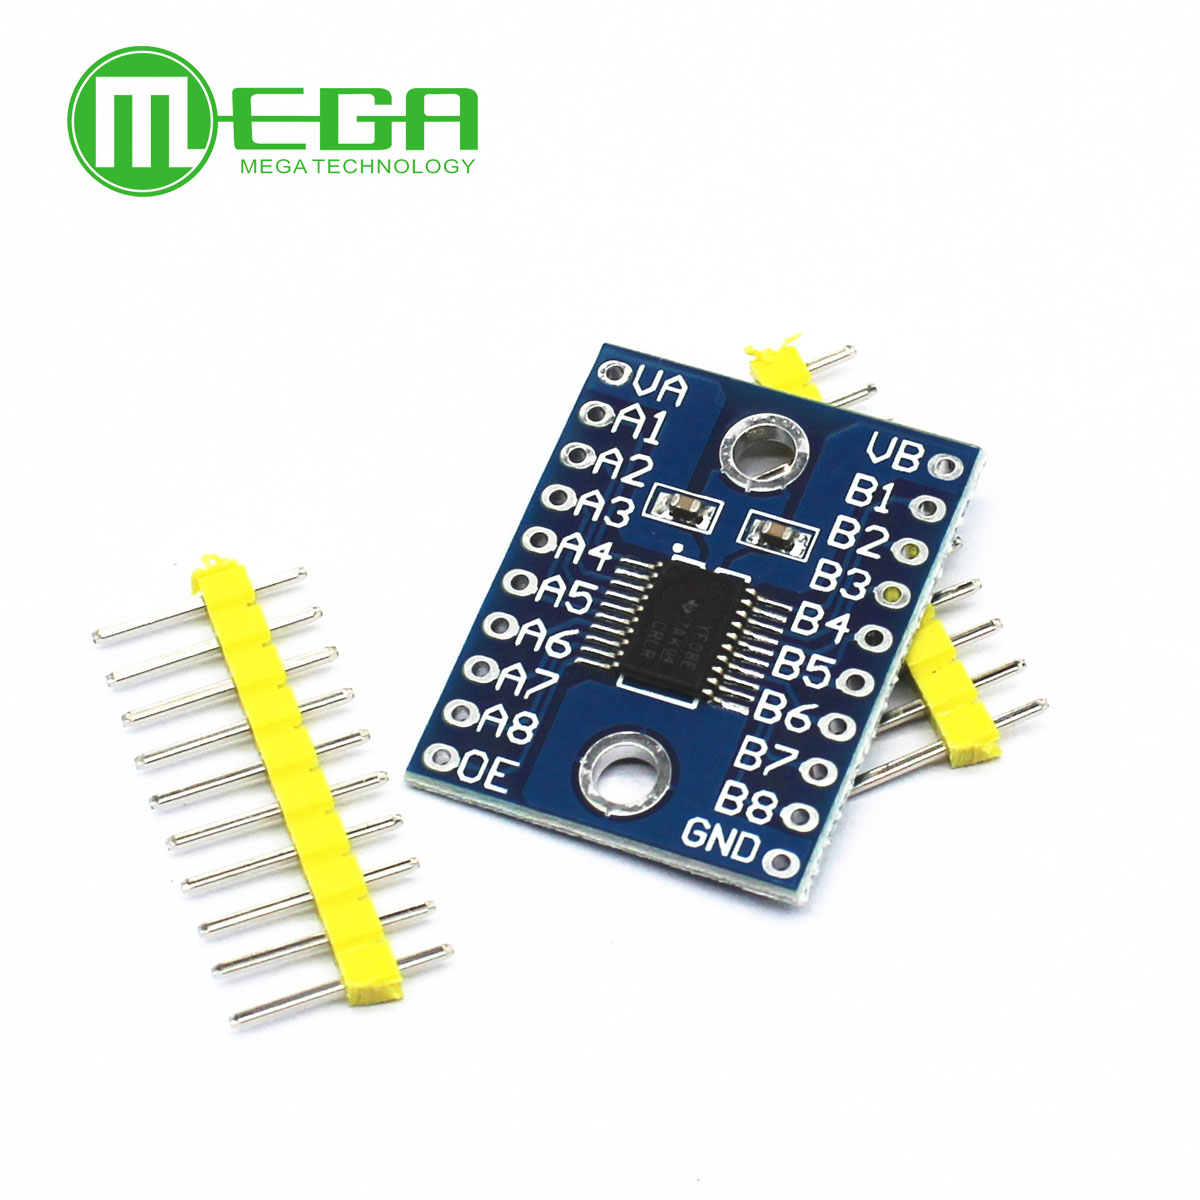 TXS0108E 3.3V 5V 8 Channel Logic Level Serial Converter TTL Bi-directional 8Ch